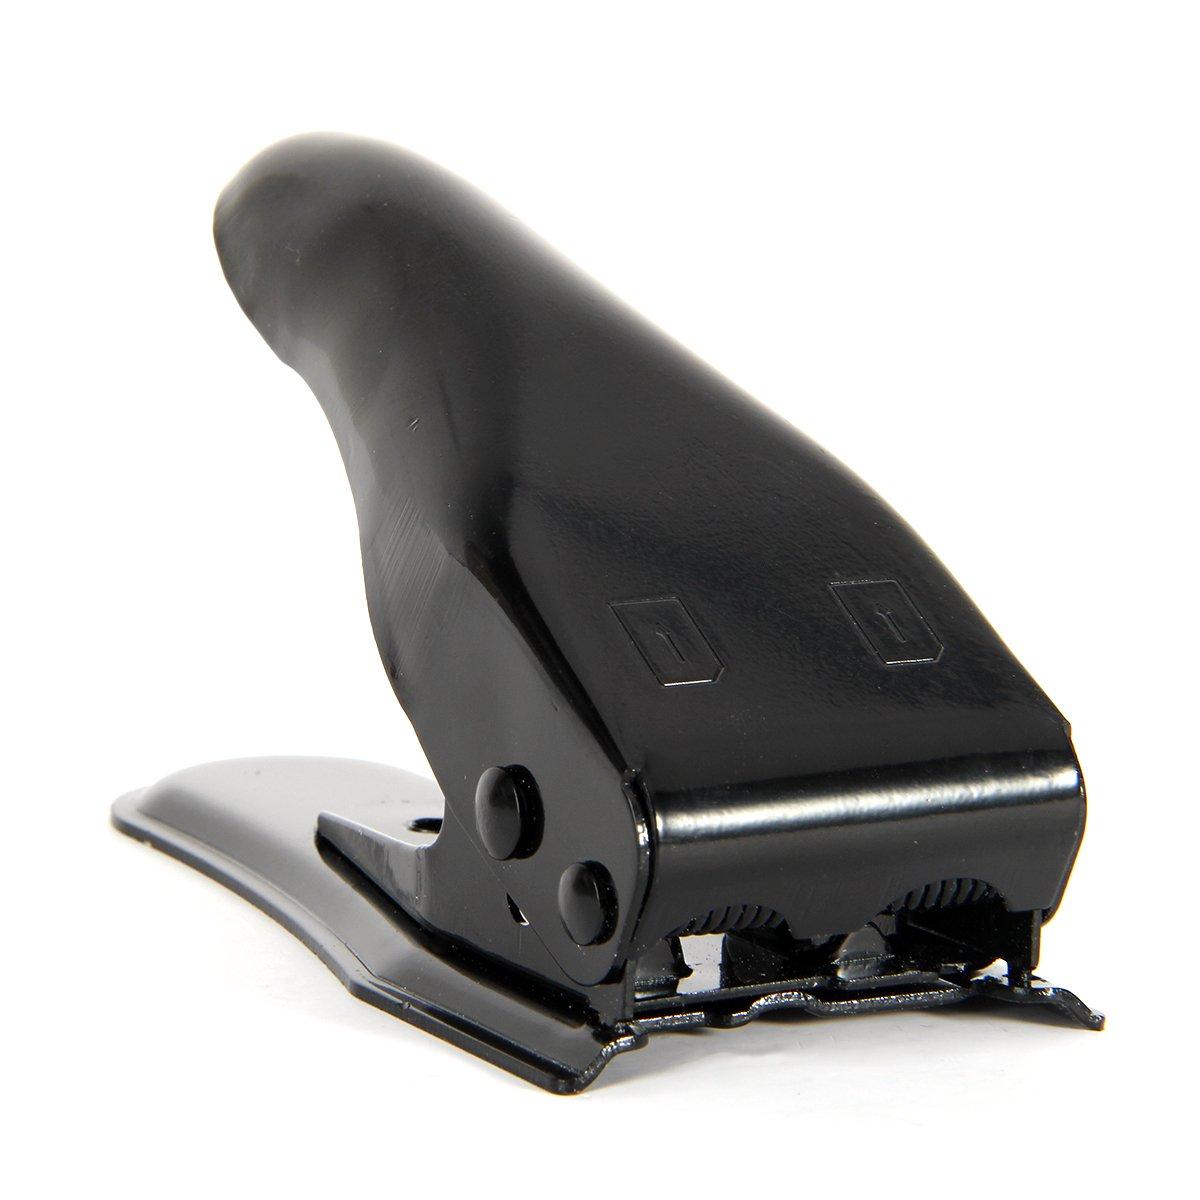 Amazon.com: Dual 2 en 1 Micro SIM Cortador de tarjeta SIM ...